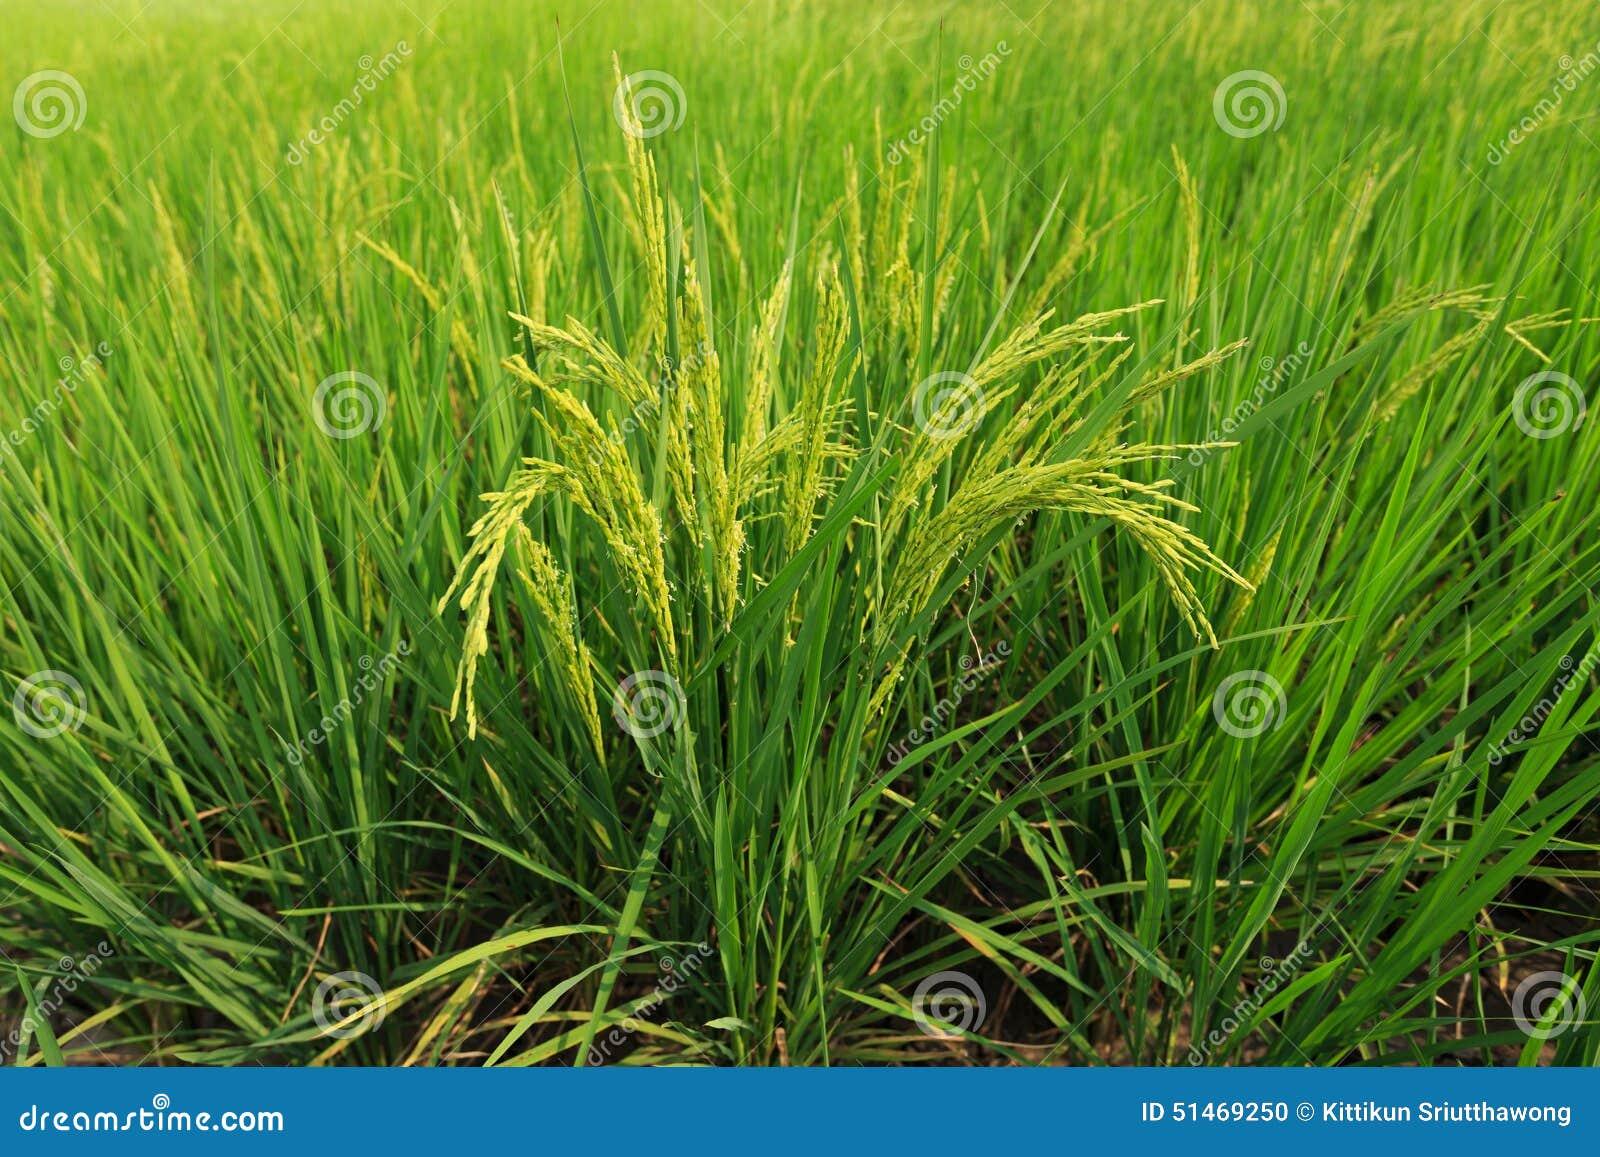 Groene rijst Thailand